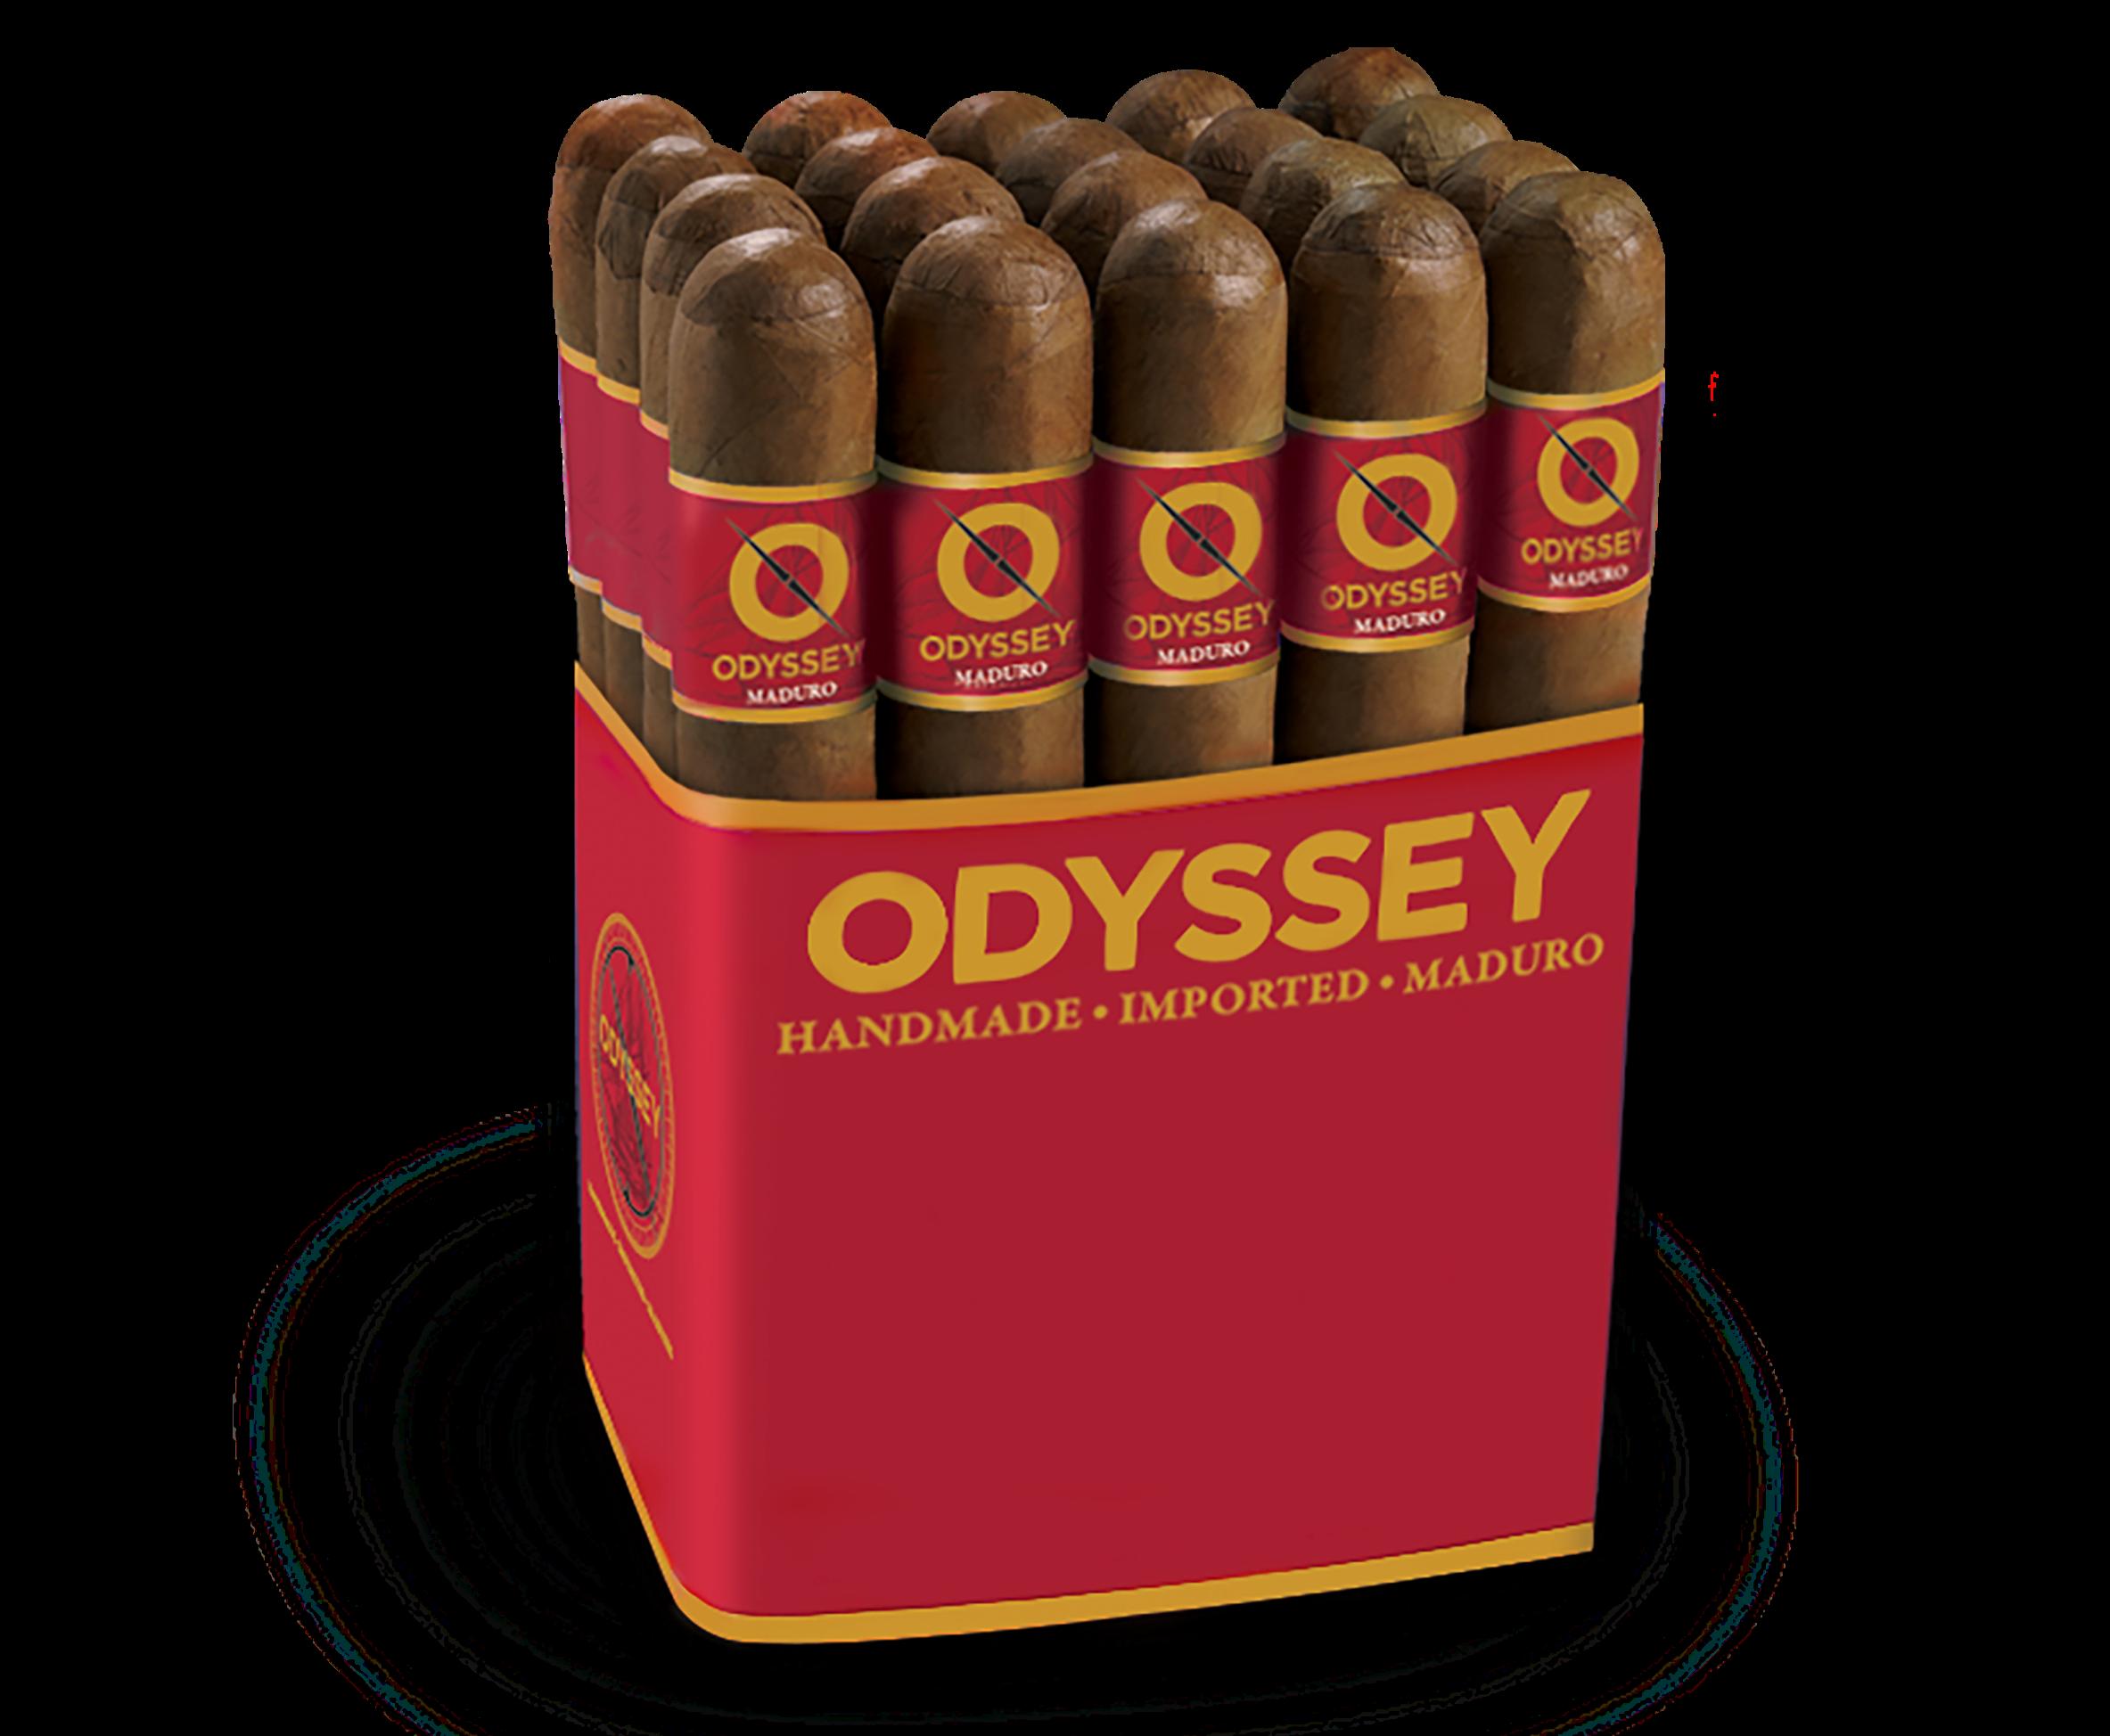 Cigar News: General Cigar Unveils Odyssey Maduro at 2018 IPCPR